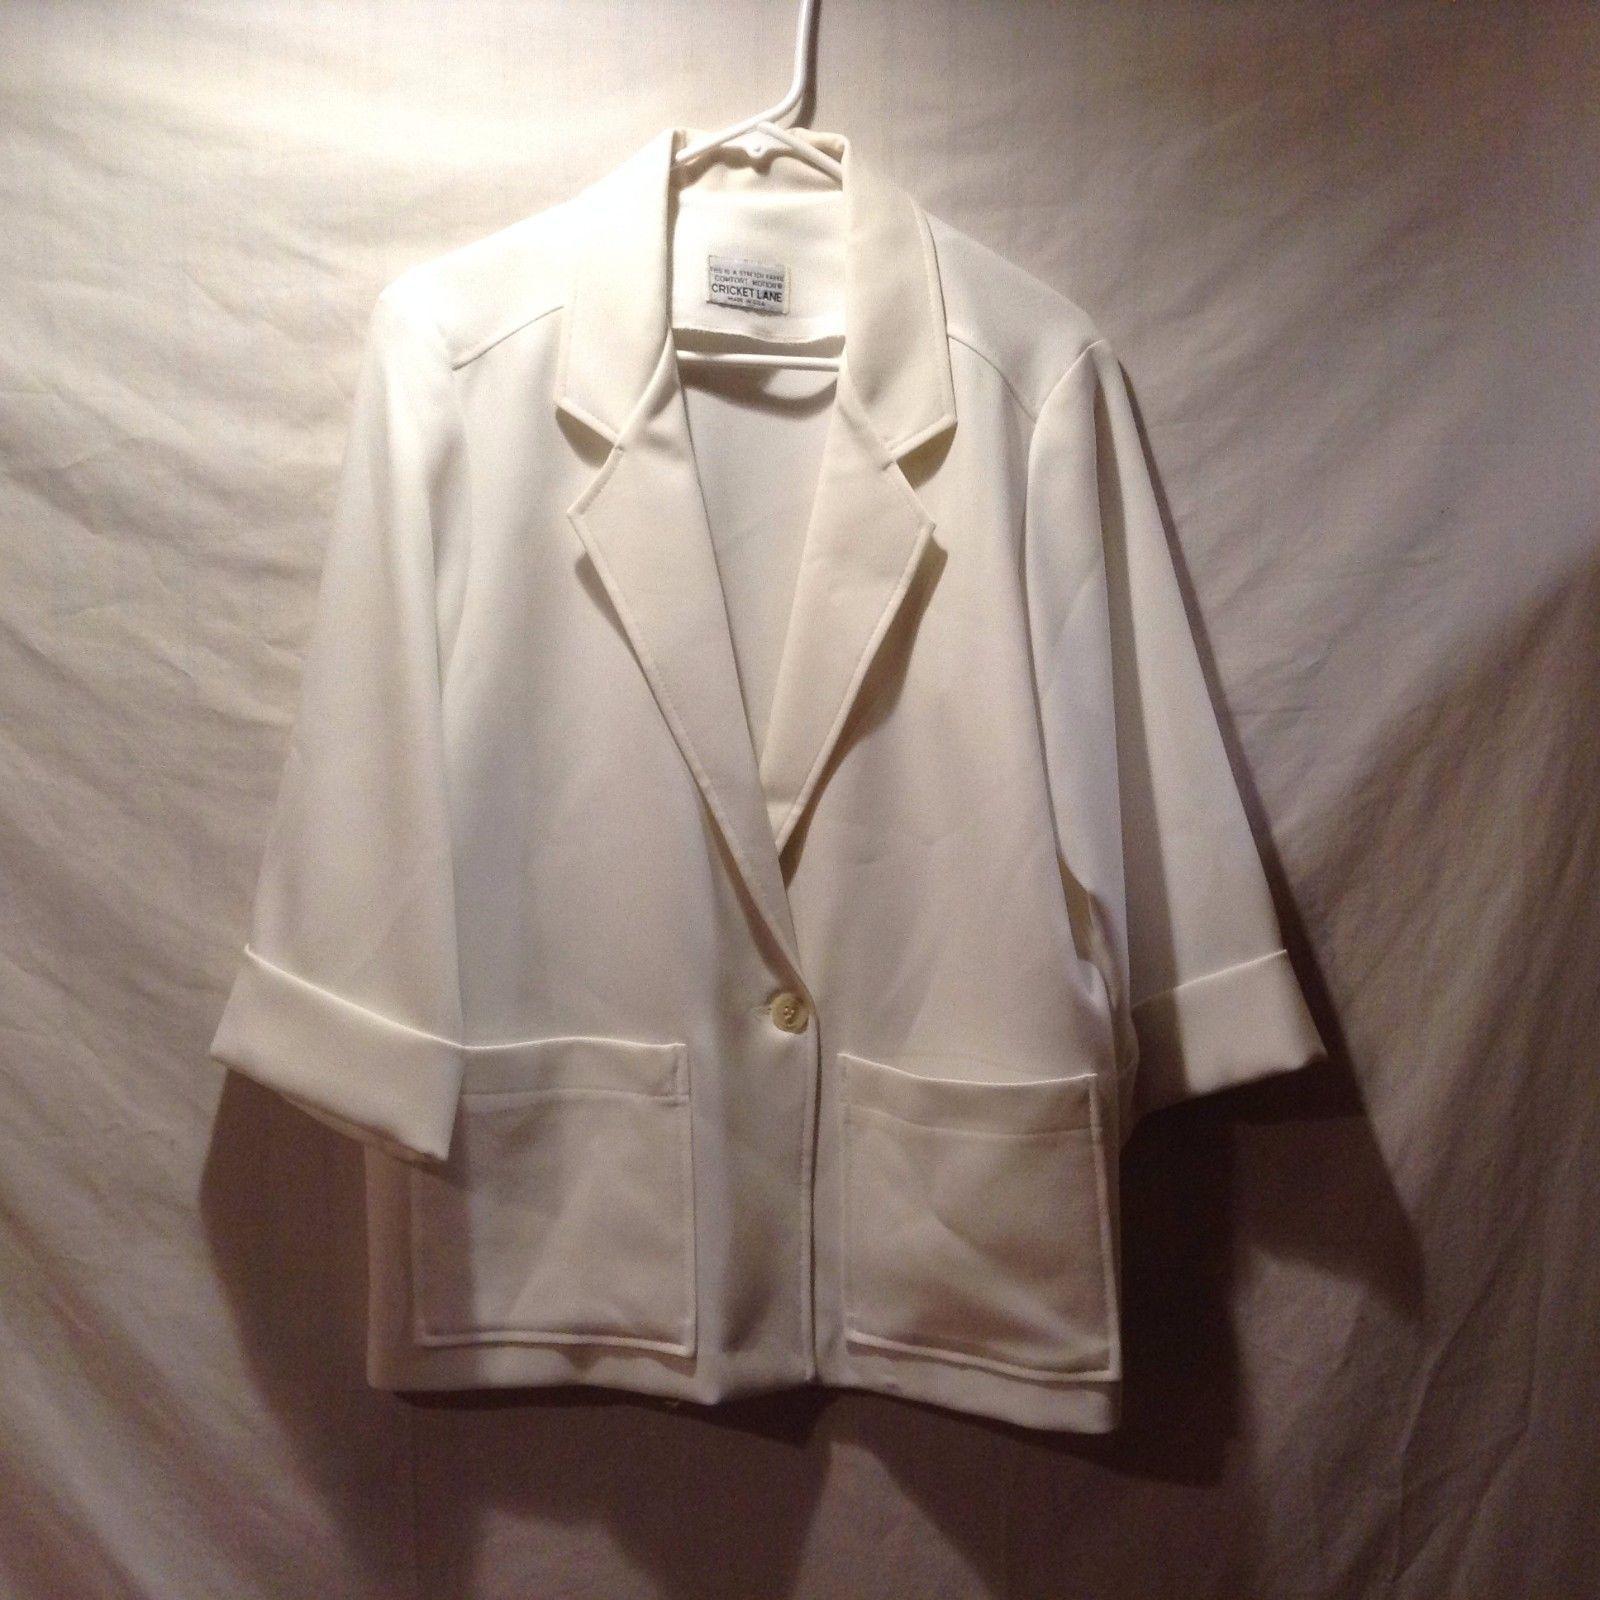 Cricket Lane Comfort Motion White 3/4 Sleeve Blazer